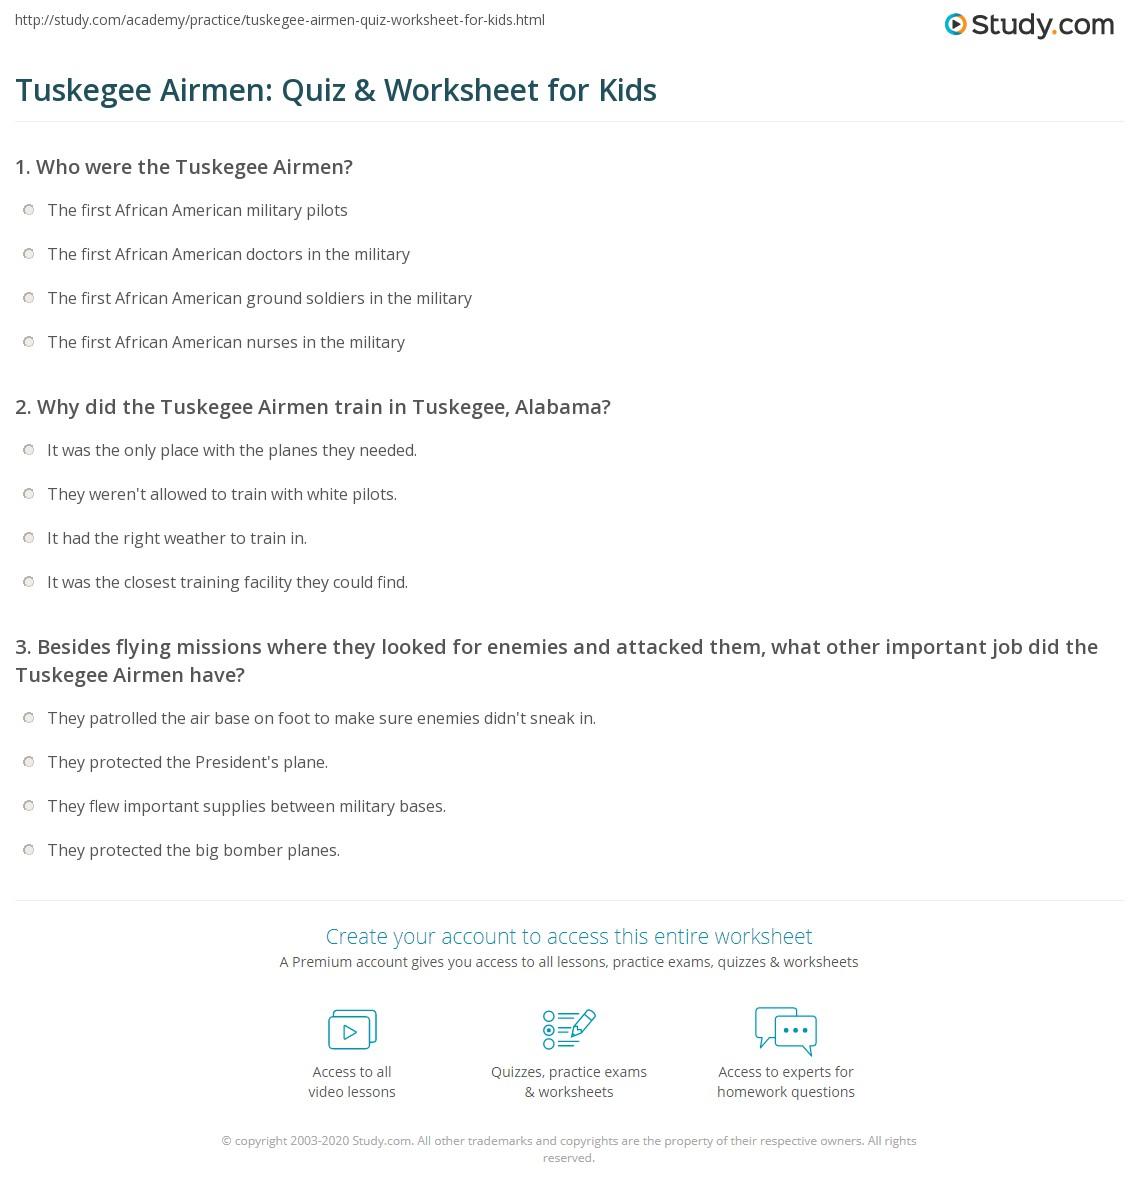 Tuskegee Airmen Quiz & Worksheet For Kids Study Com